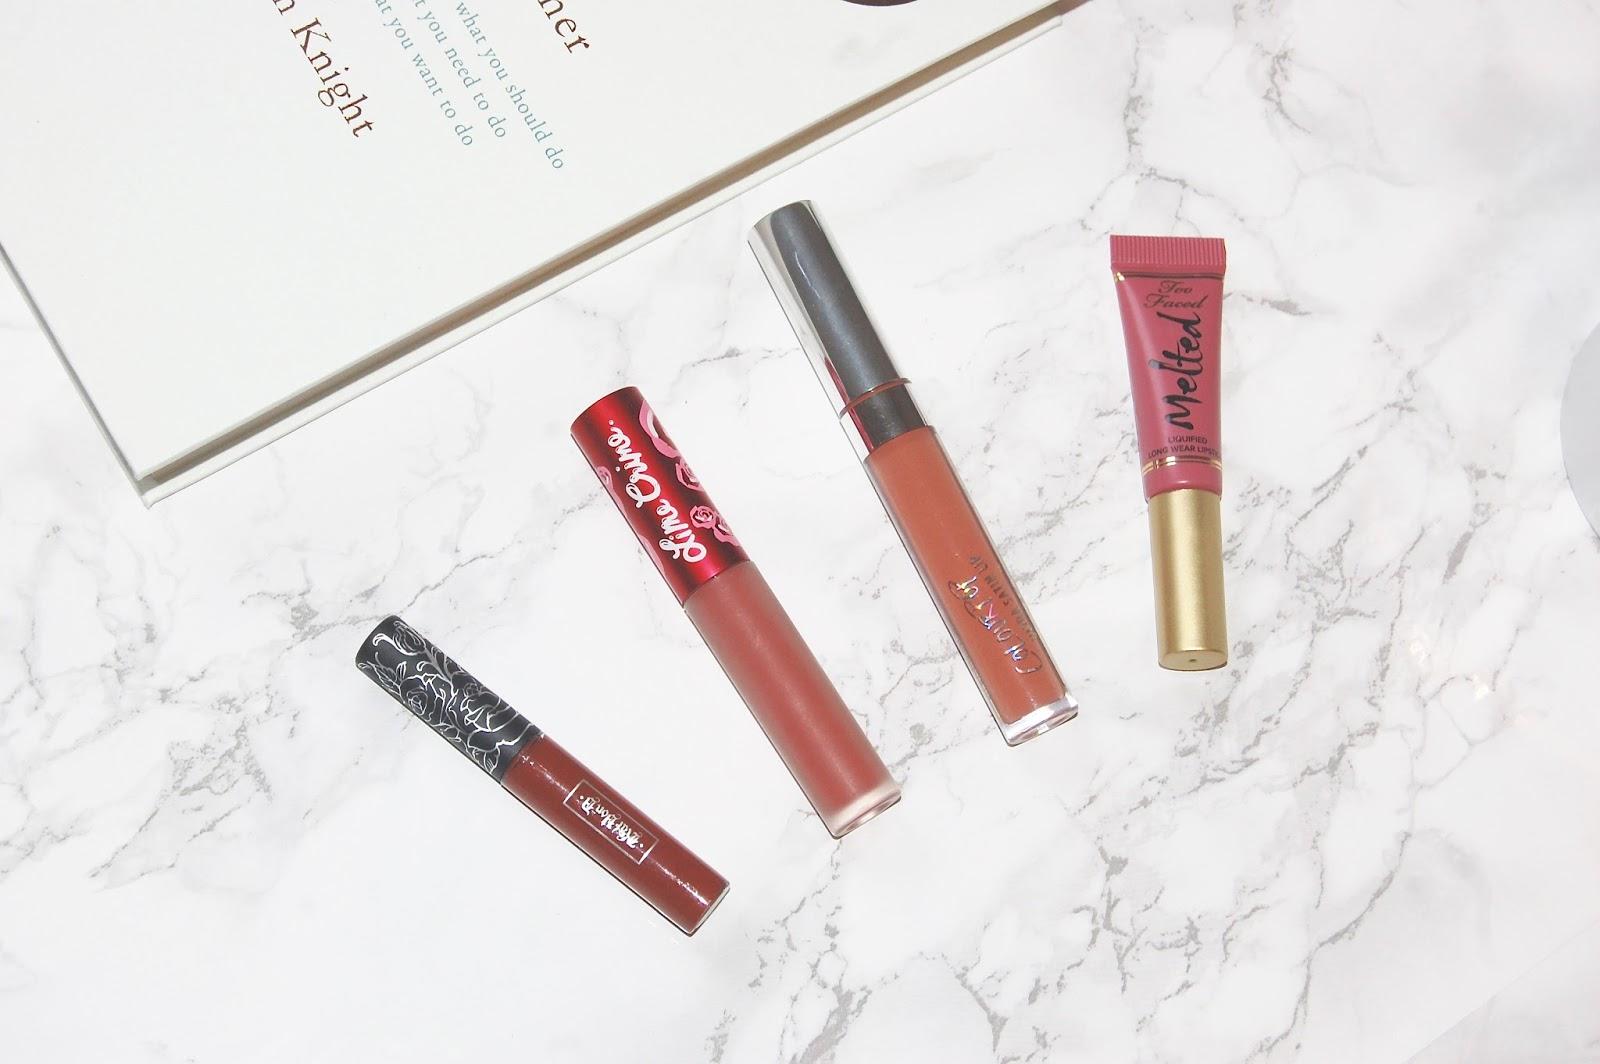 My favourite liquid lipsticks - Colourpop, Kat Von D, Too Faced and Lime Crime